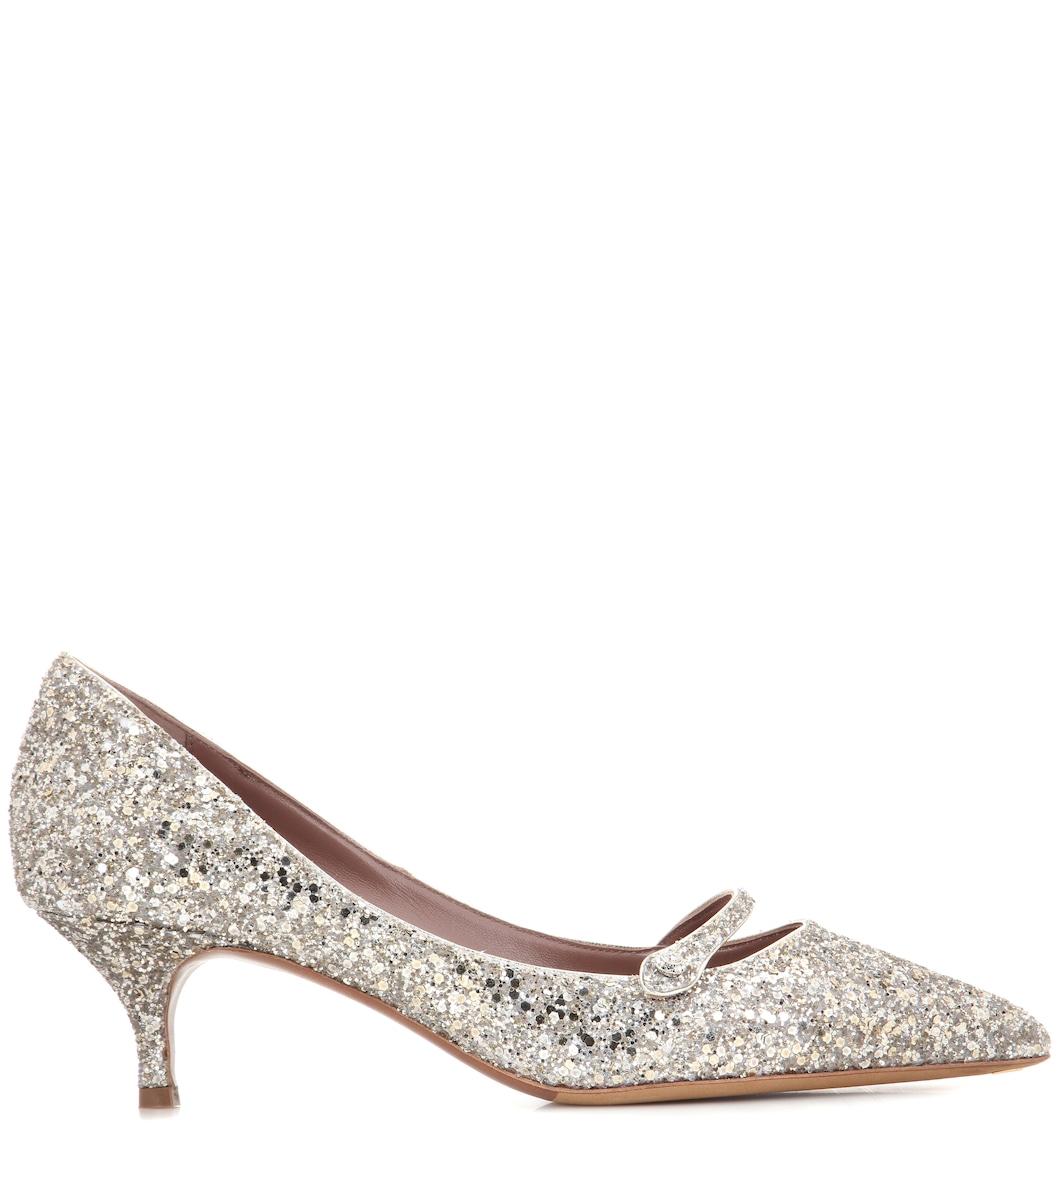 1dd1a9525524 Tabitha Simmons - Layton glitter pumps | Mytheresa